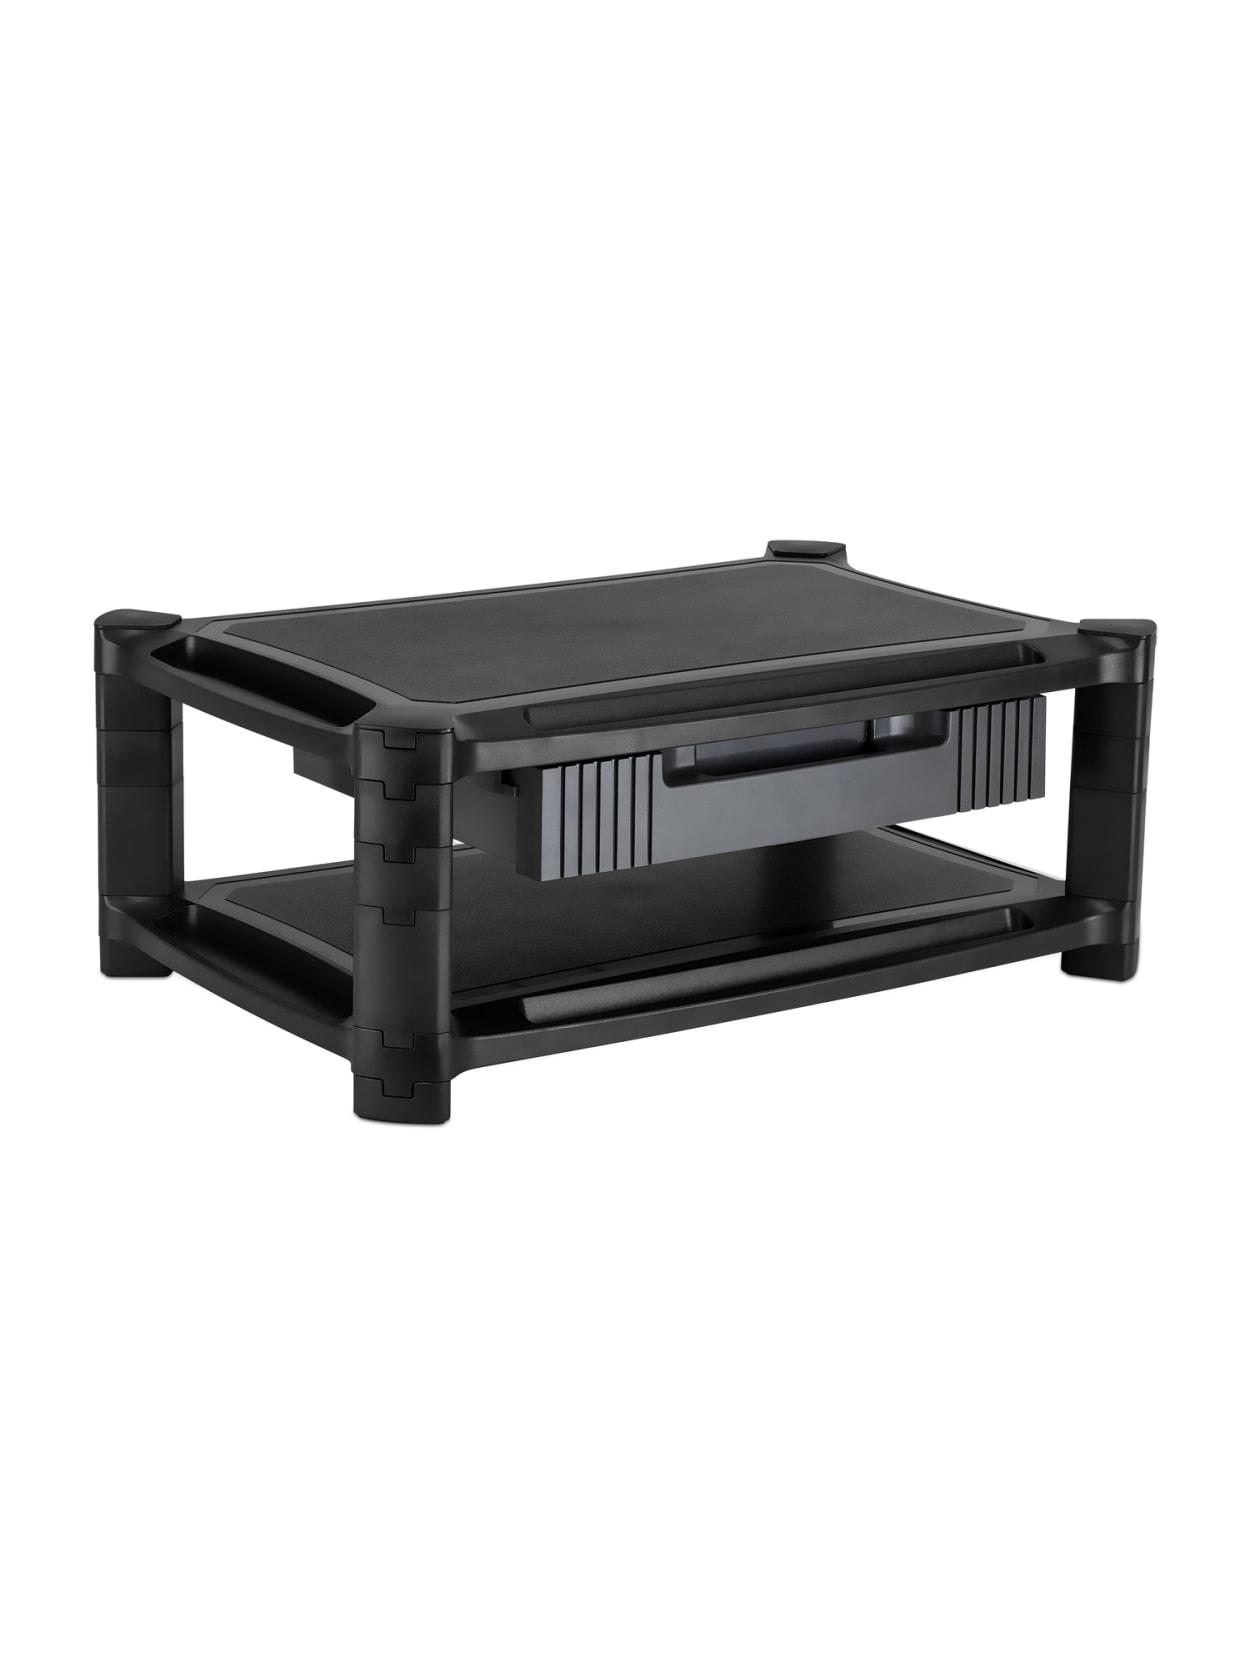 Mount It Mi 7853 Desktop Printer Stand Black Office Depot